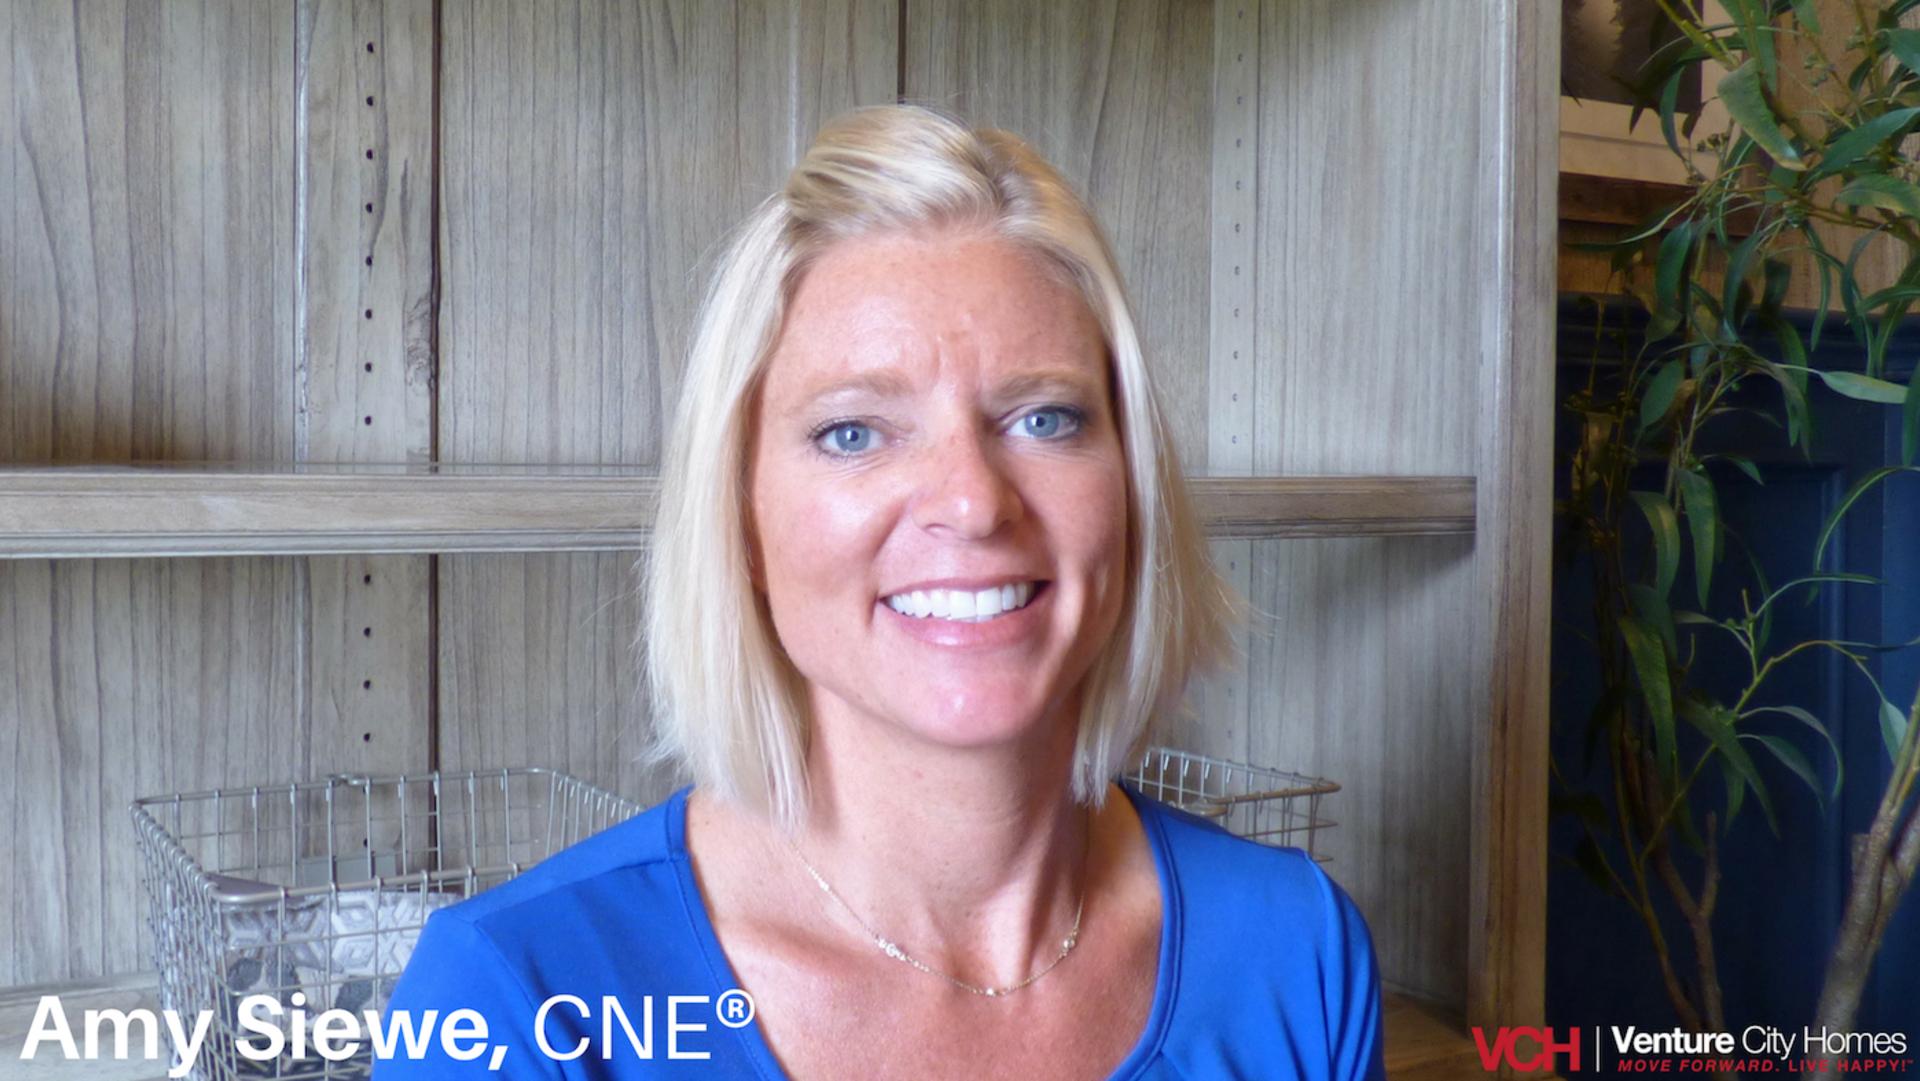 What's a CNE®?